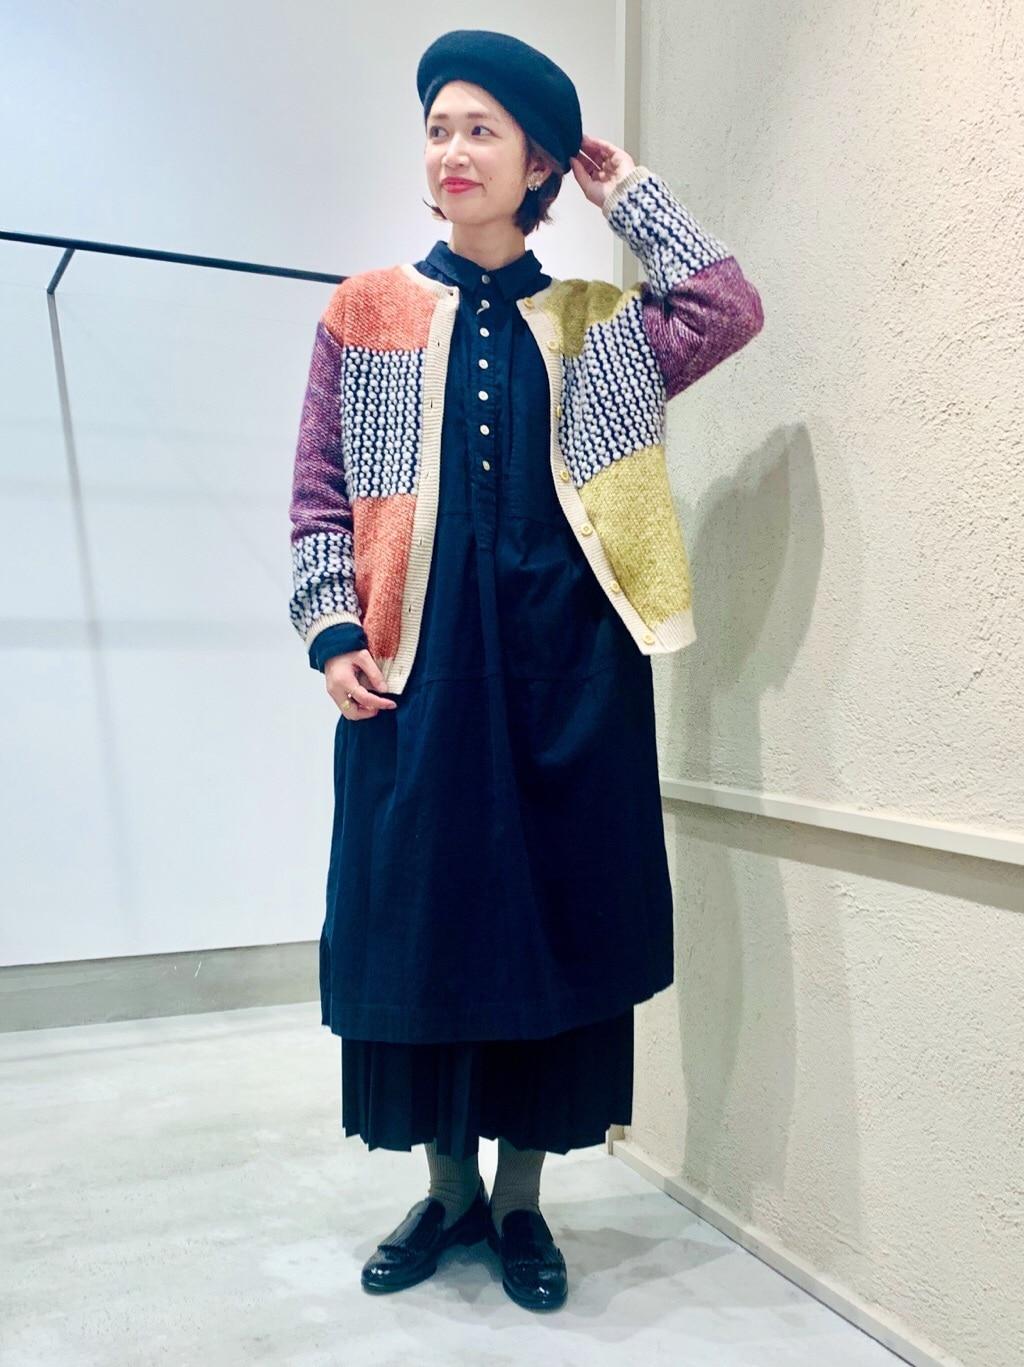 chambre de charme 横浜ジョイナス 身長:160cm 2020.12.21